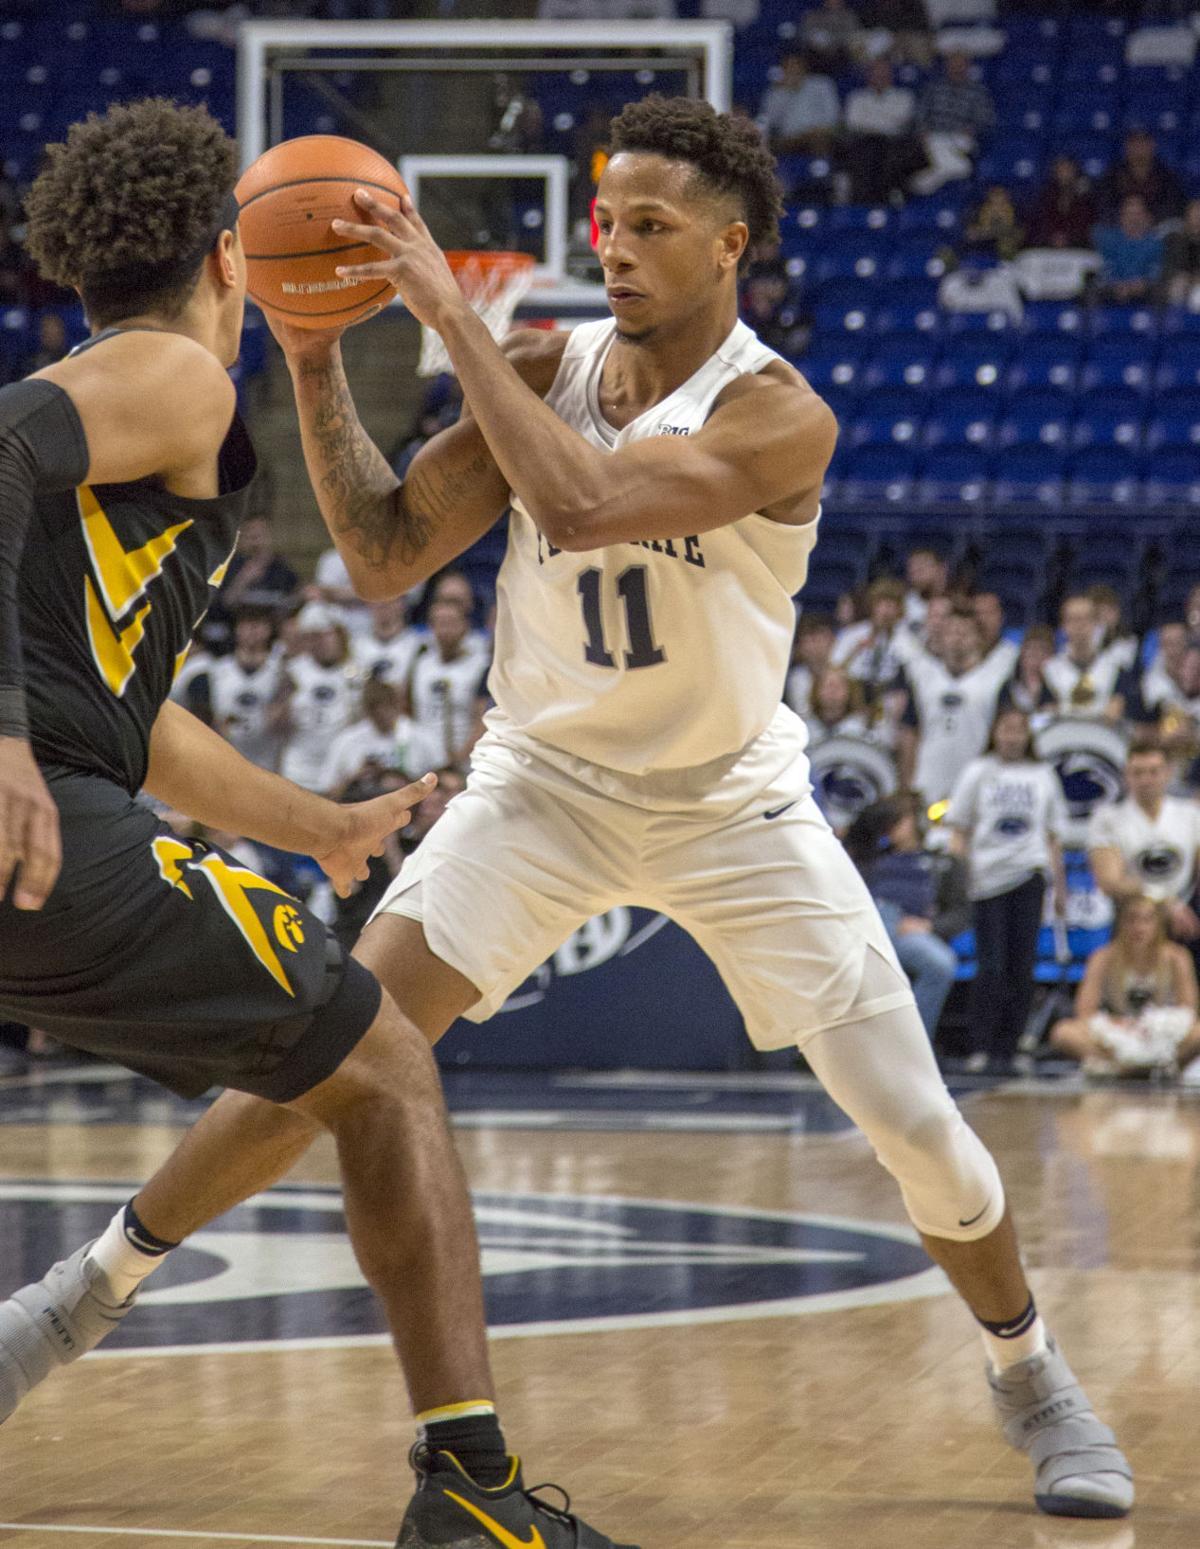 Men's Basketball, Iowa, Lamar Stevens (11)